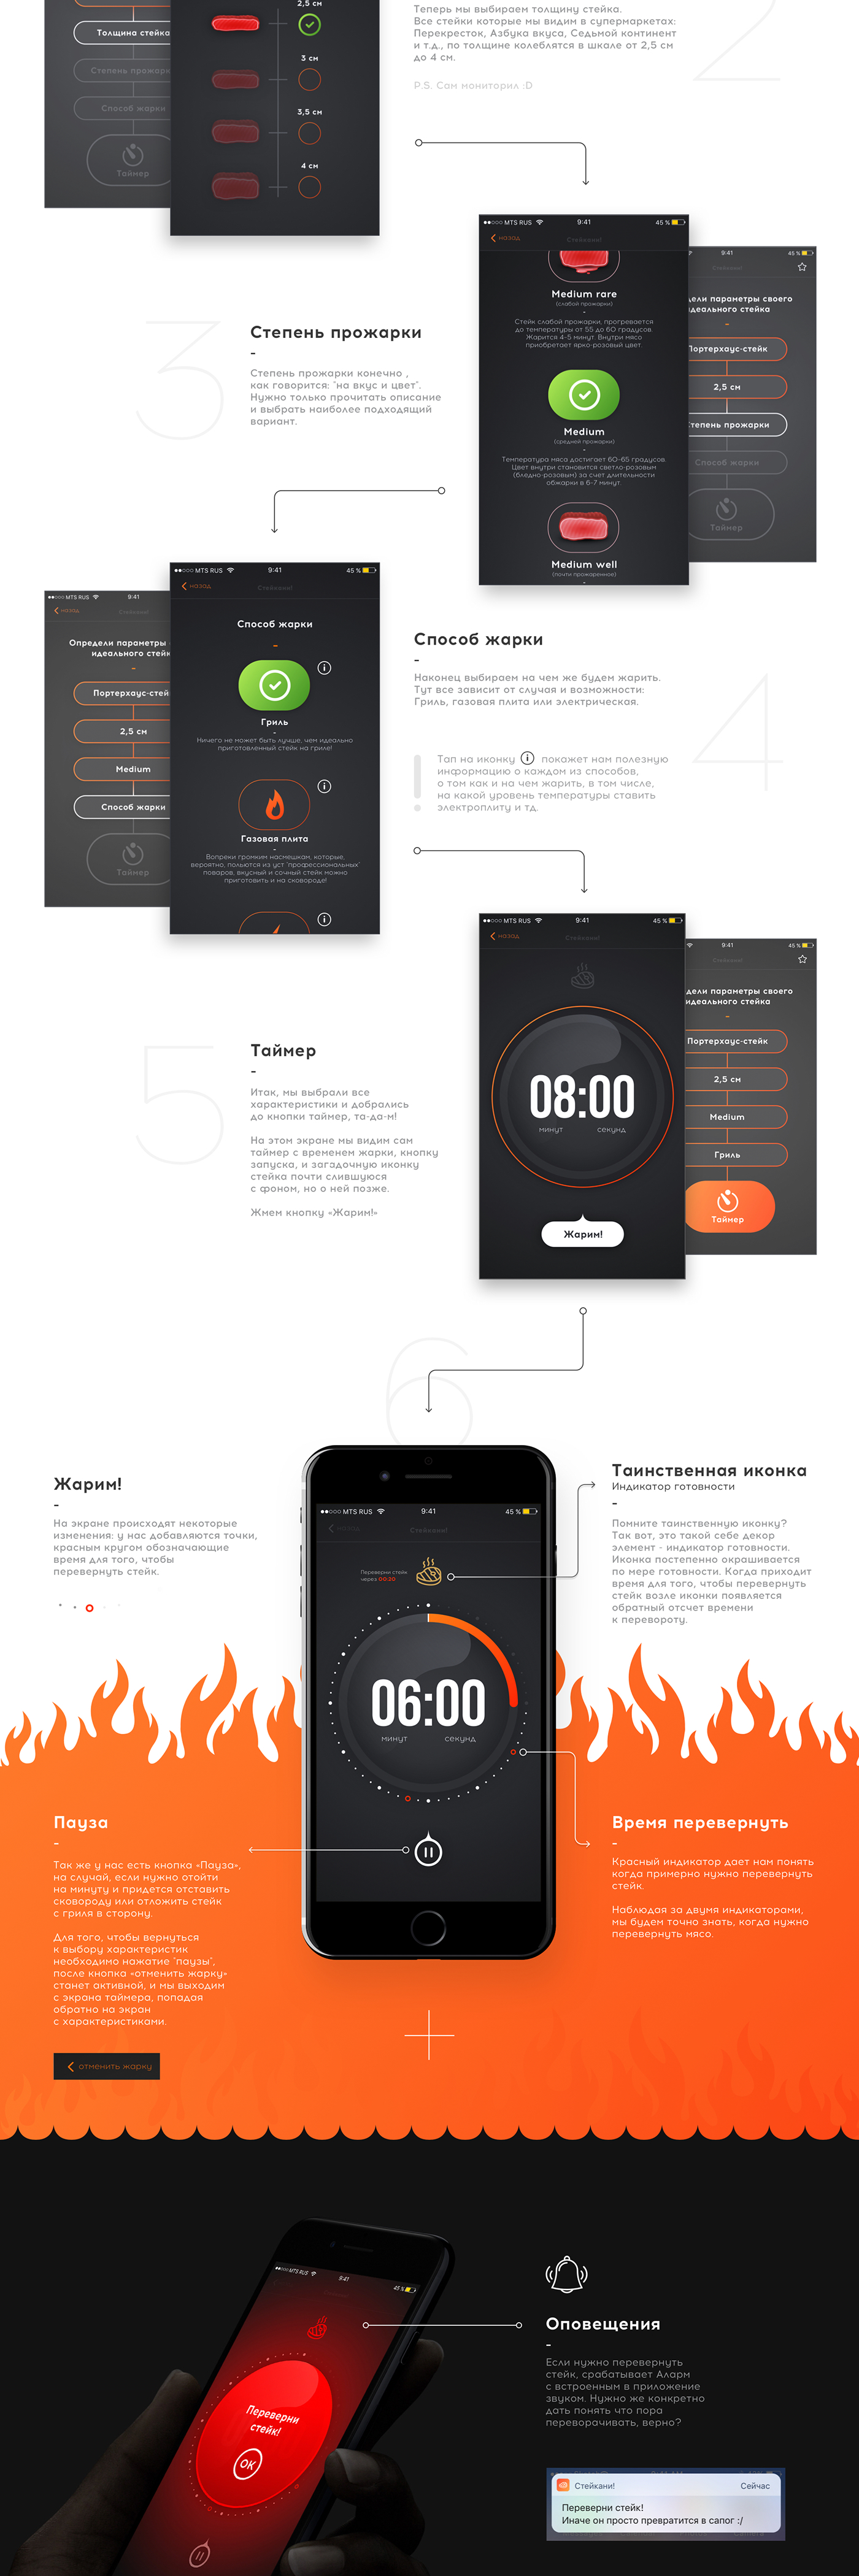 ios material design Mobile app meat UI/UX concept sketch timer Food  art direction